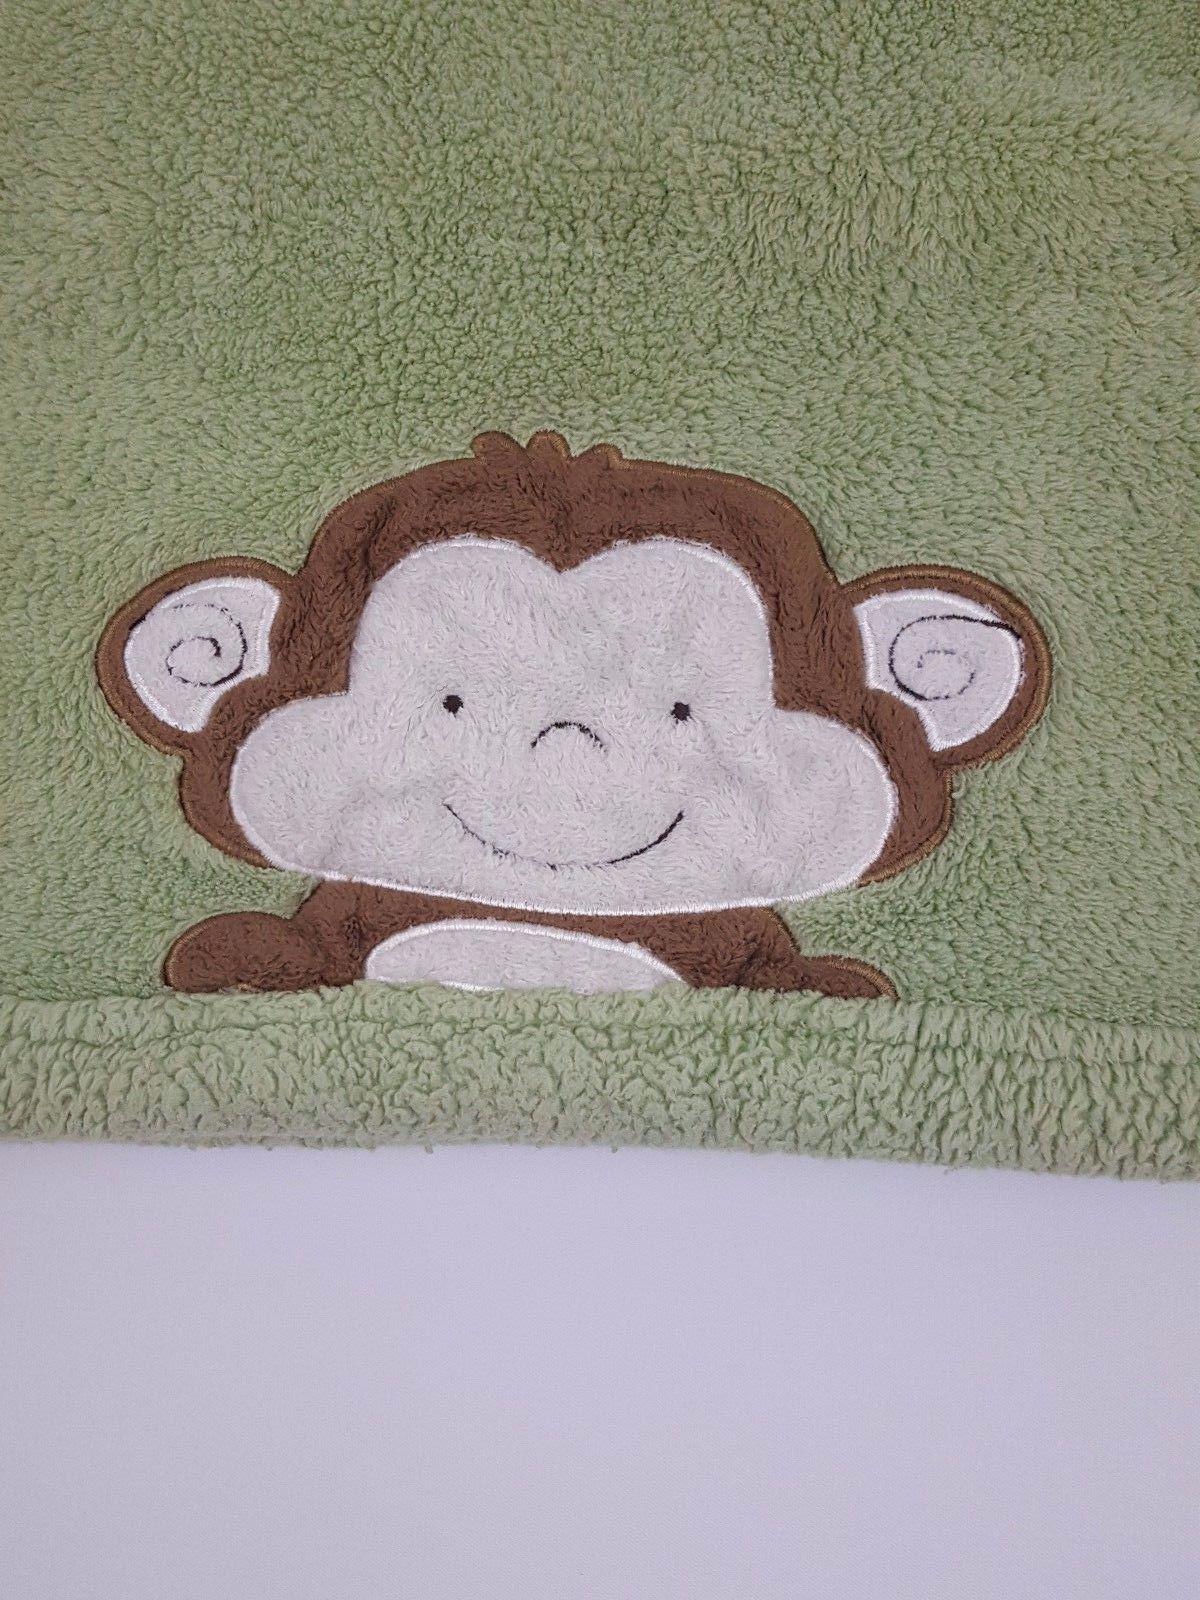 Tiddliwinks Monkey Green Blanket Brown Kidsline Baby Lovey Security 30 x 40